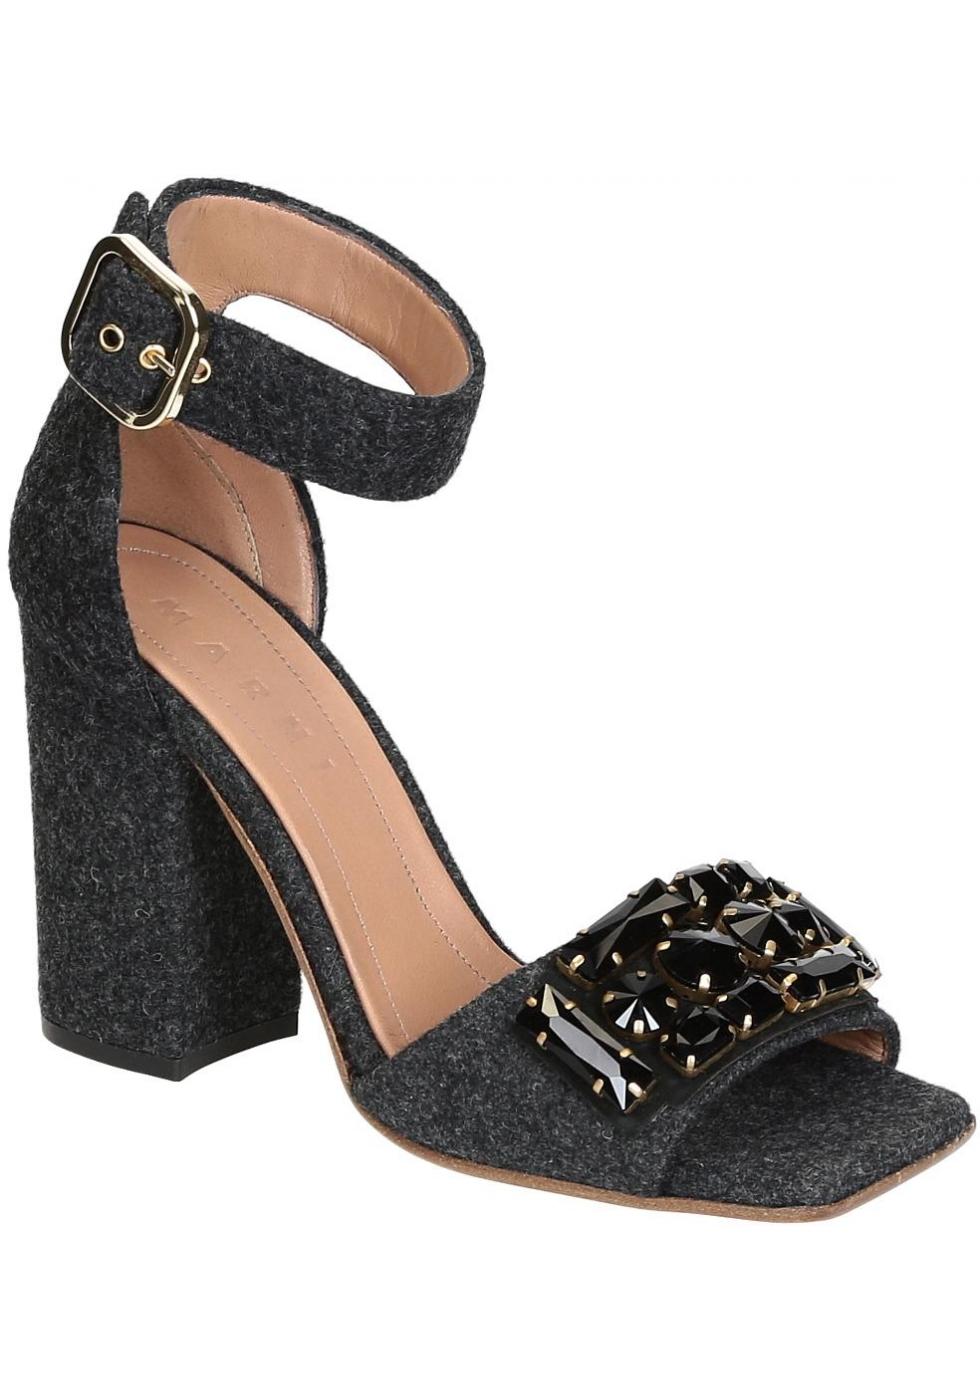 Marni High Heels Sandals In Dark Gray Felt With Crystals Italian Boutique